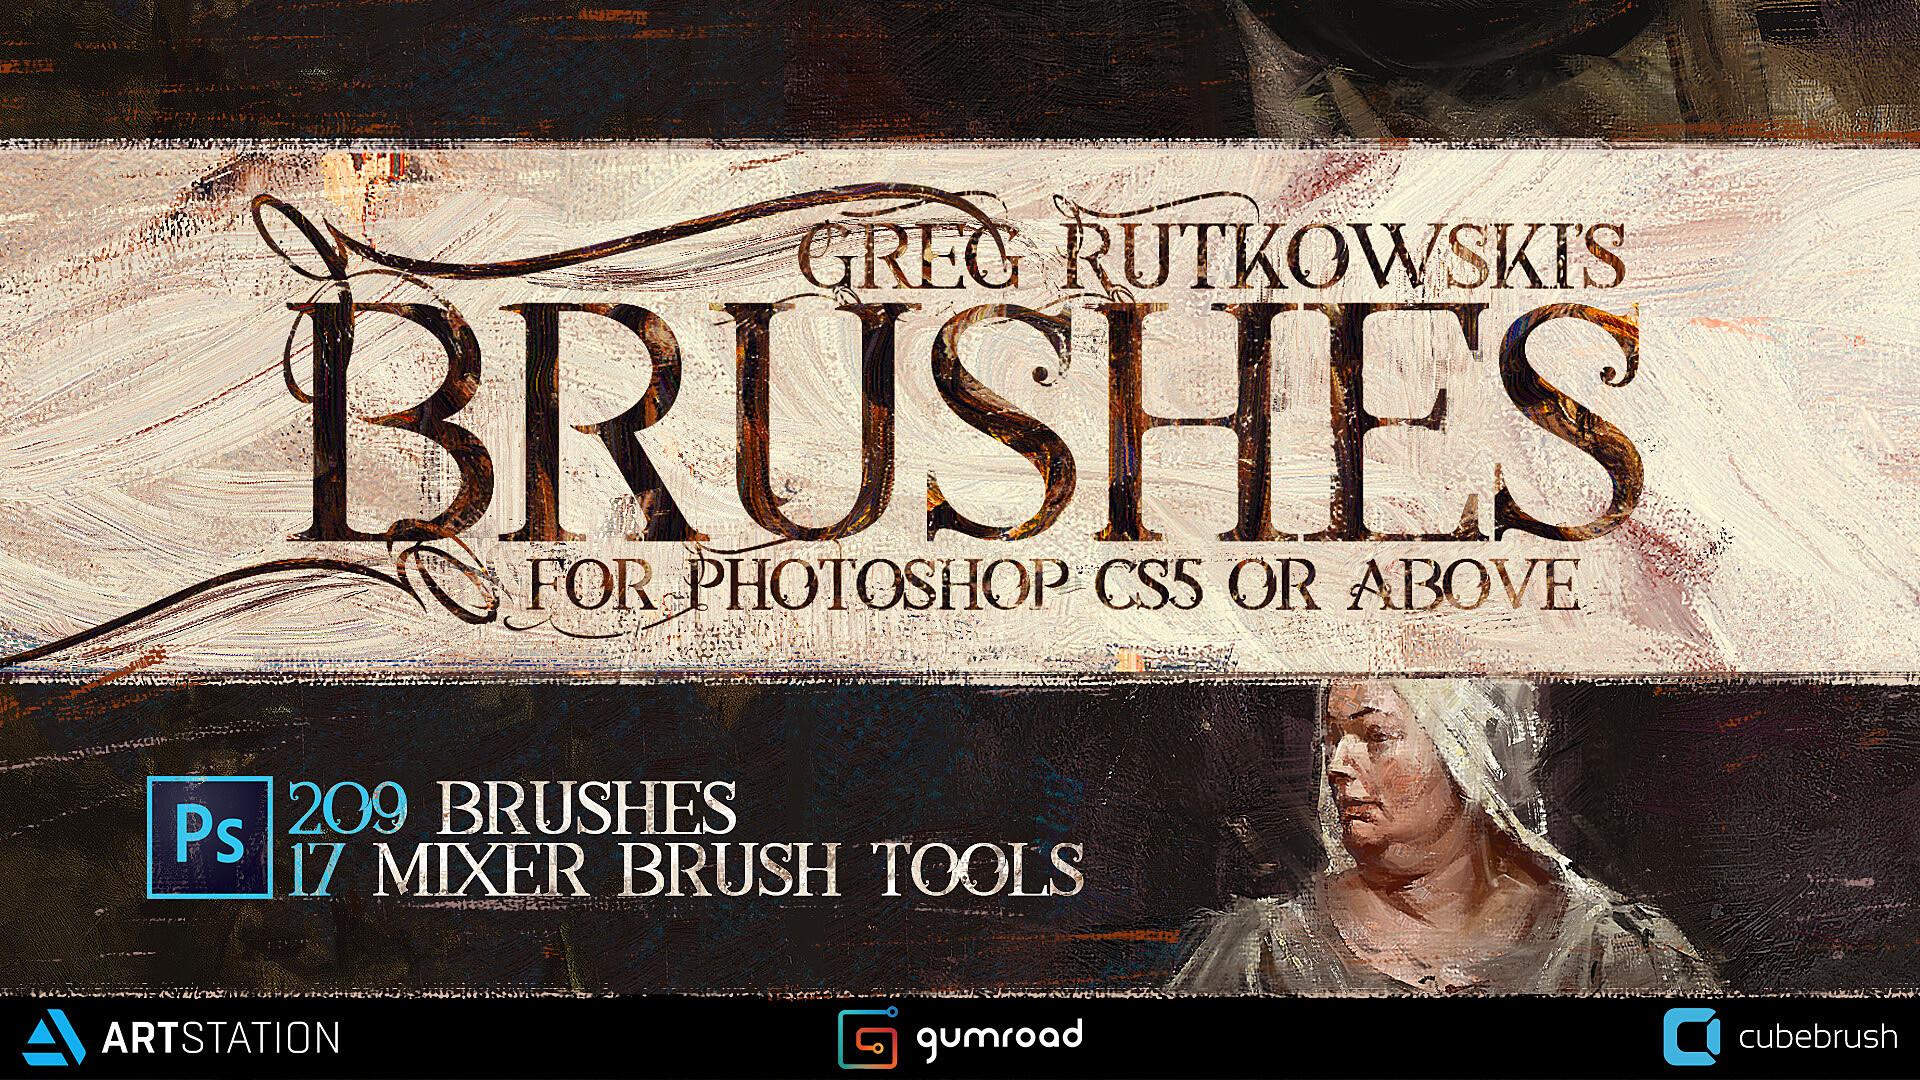 Greg rutkowski ultimate brushes